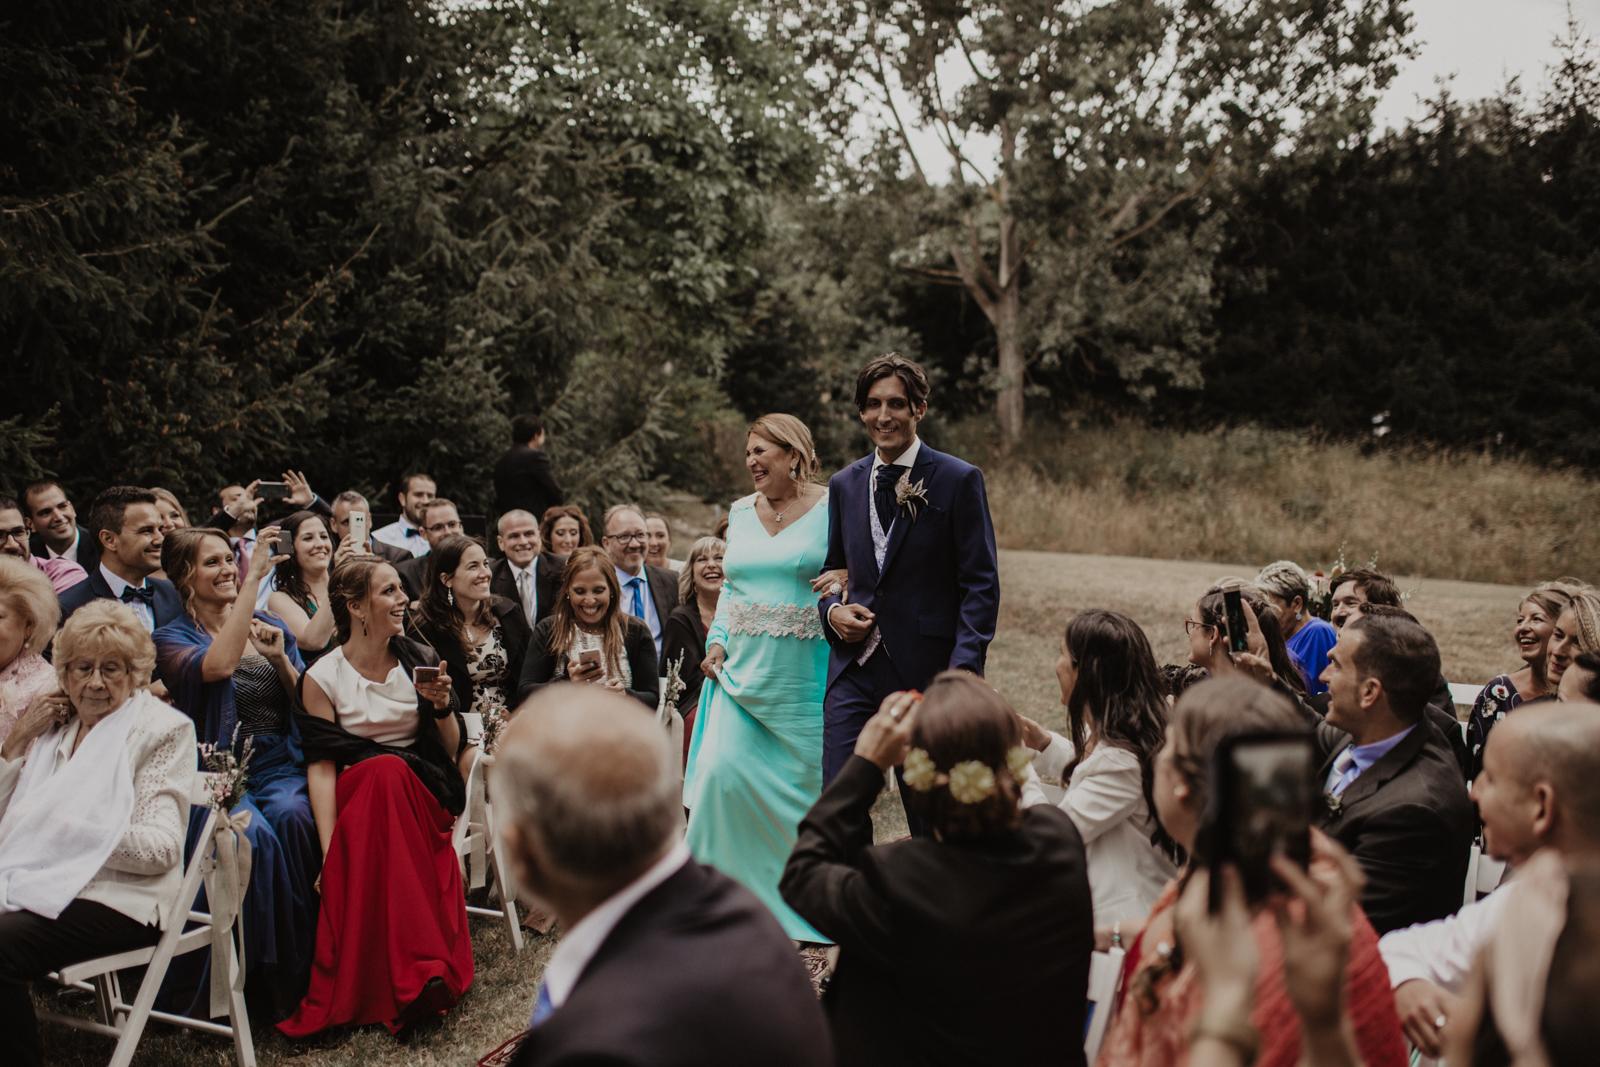 thenortherngirlphotography_photography_thenortherngirl_rebeccascabros_wedding_weddingphotography_weddingphotographer_barcelona_bodaenbarcelona_bodaenmaselmarti_bodarogeryvane-339.jpg